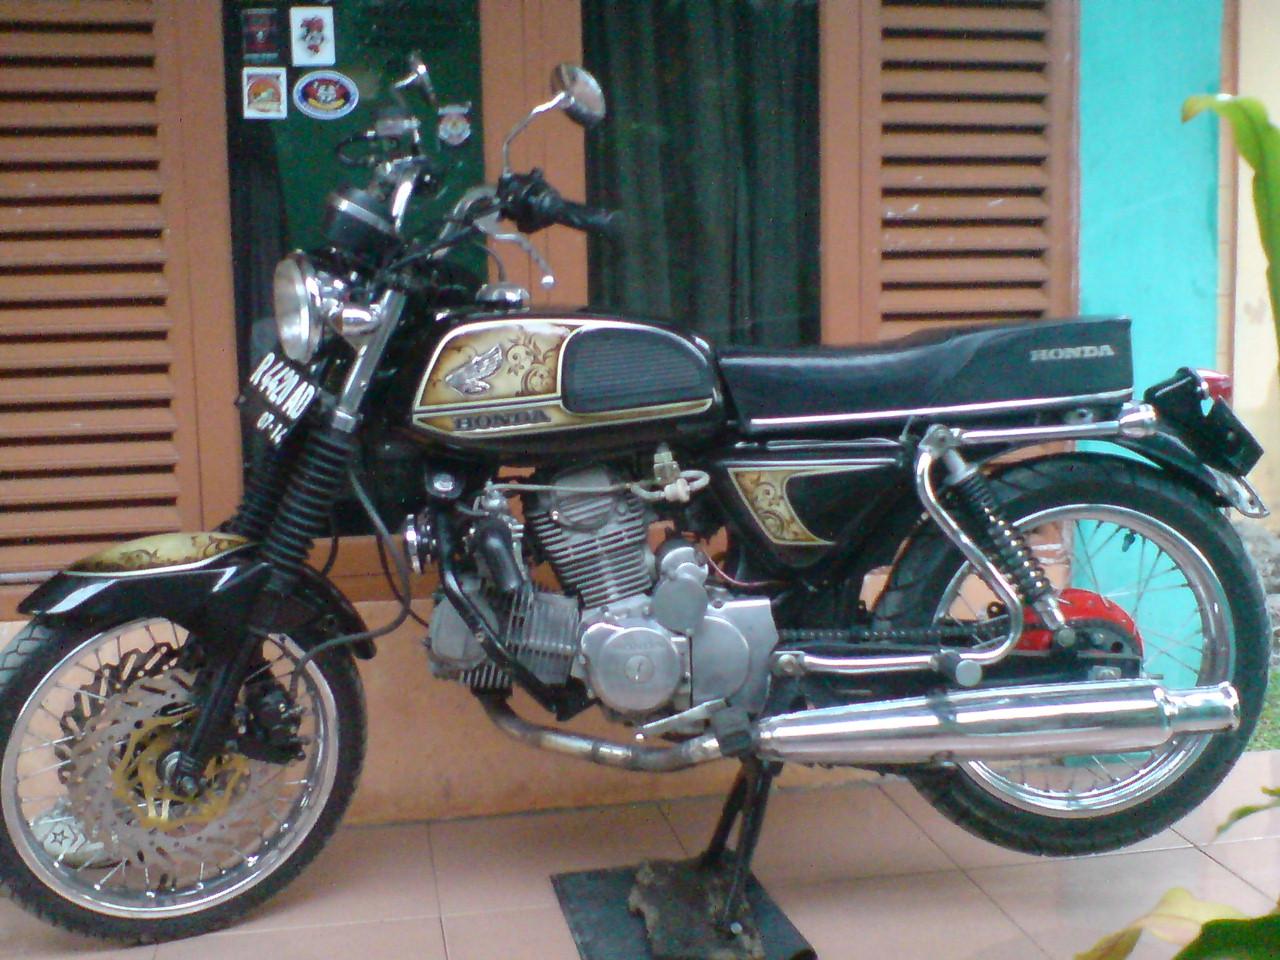 Pijar 39 cb blogs honda cb100 1975 rebuild to v engine 400cc for Western hills honda yamaha cincinnati oh